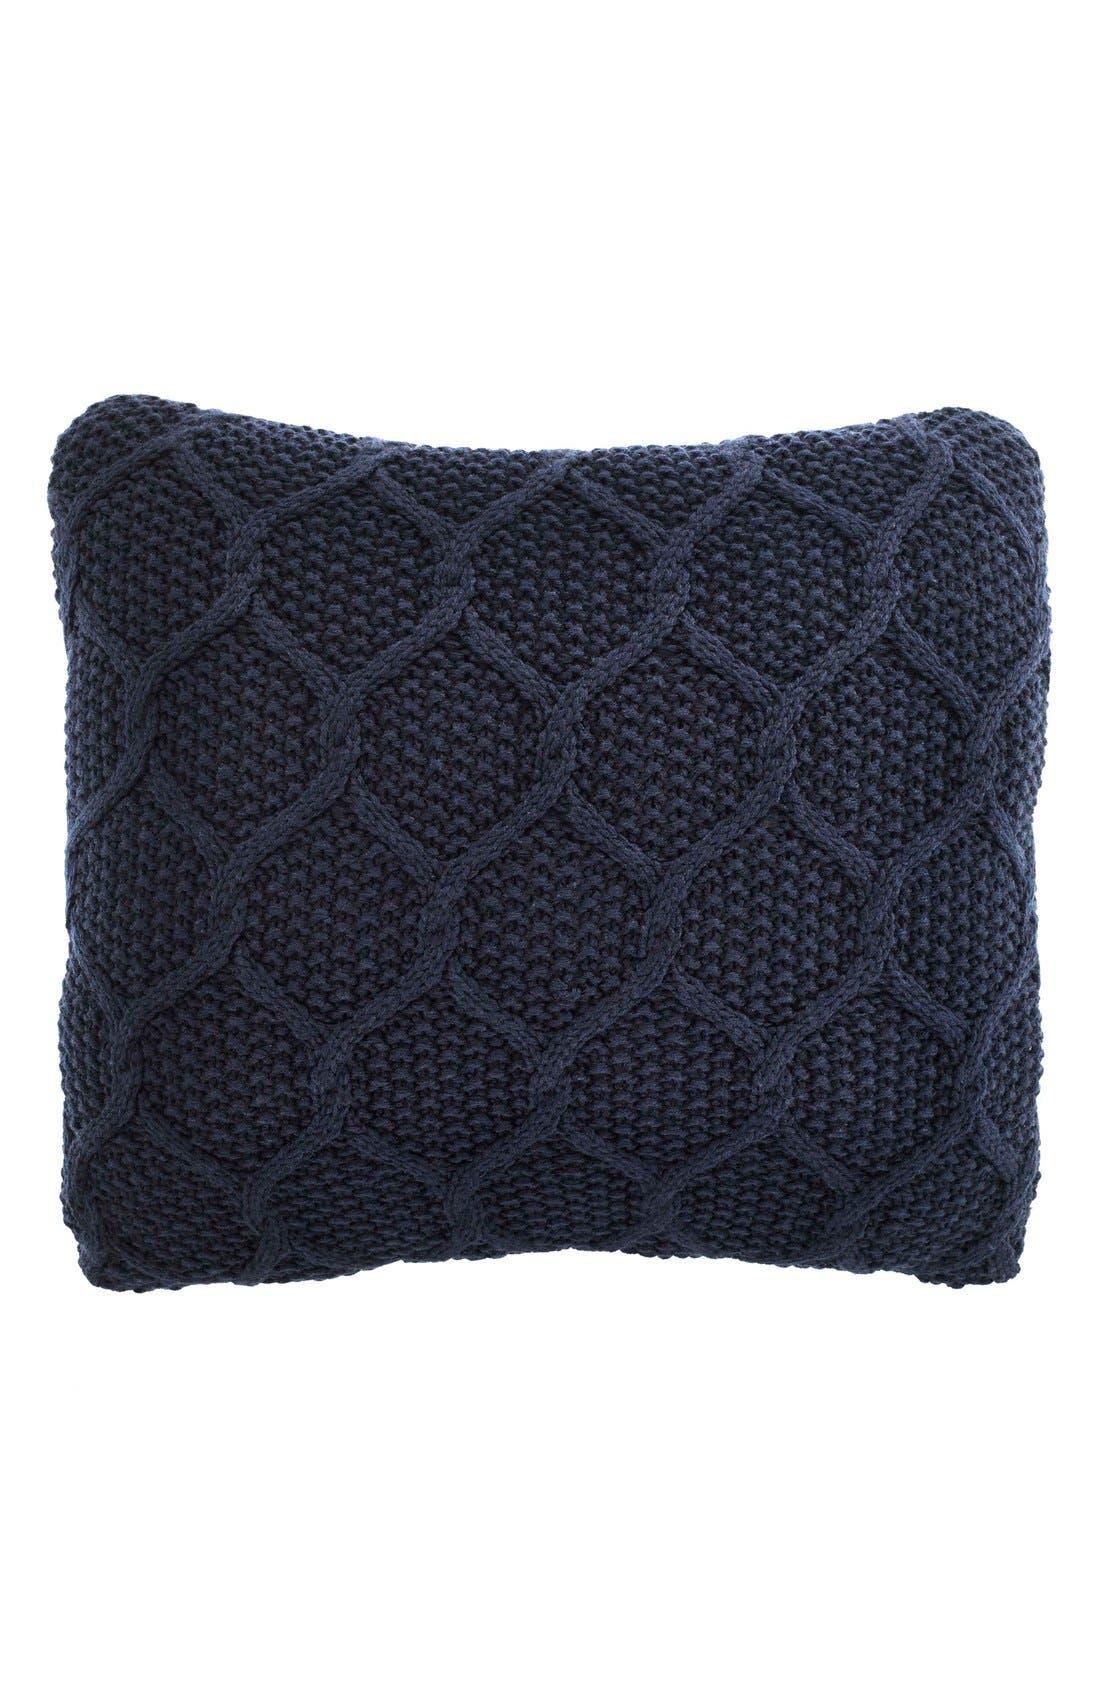 Alternate Image 1 Selected - Nautica 'Ayer' Pillow